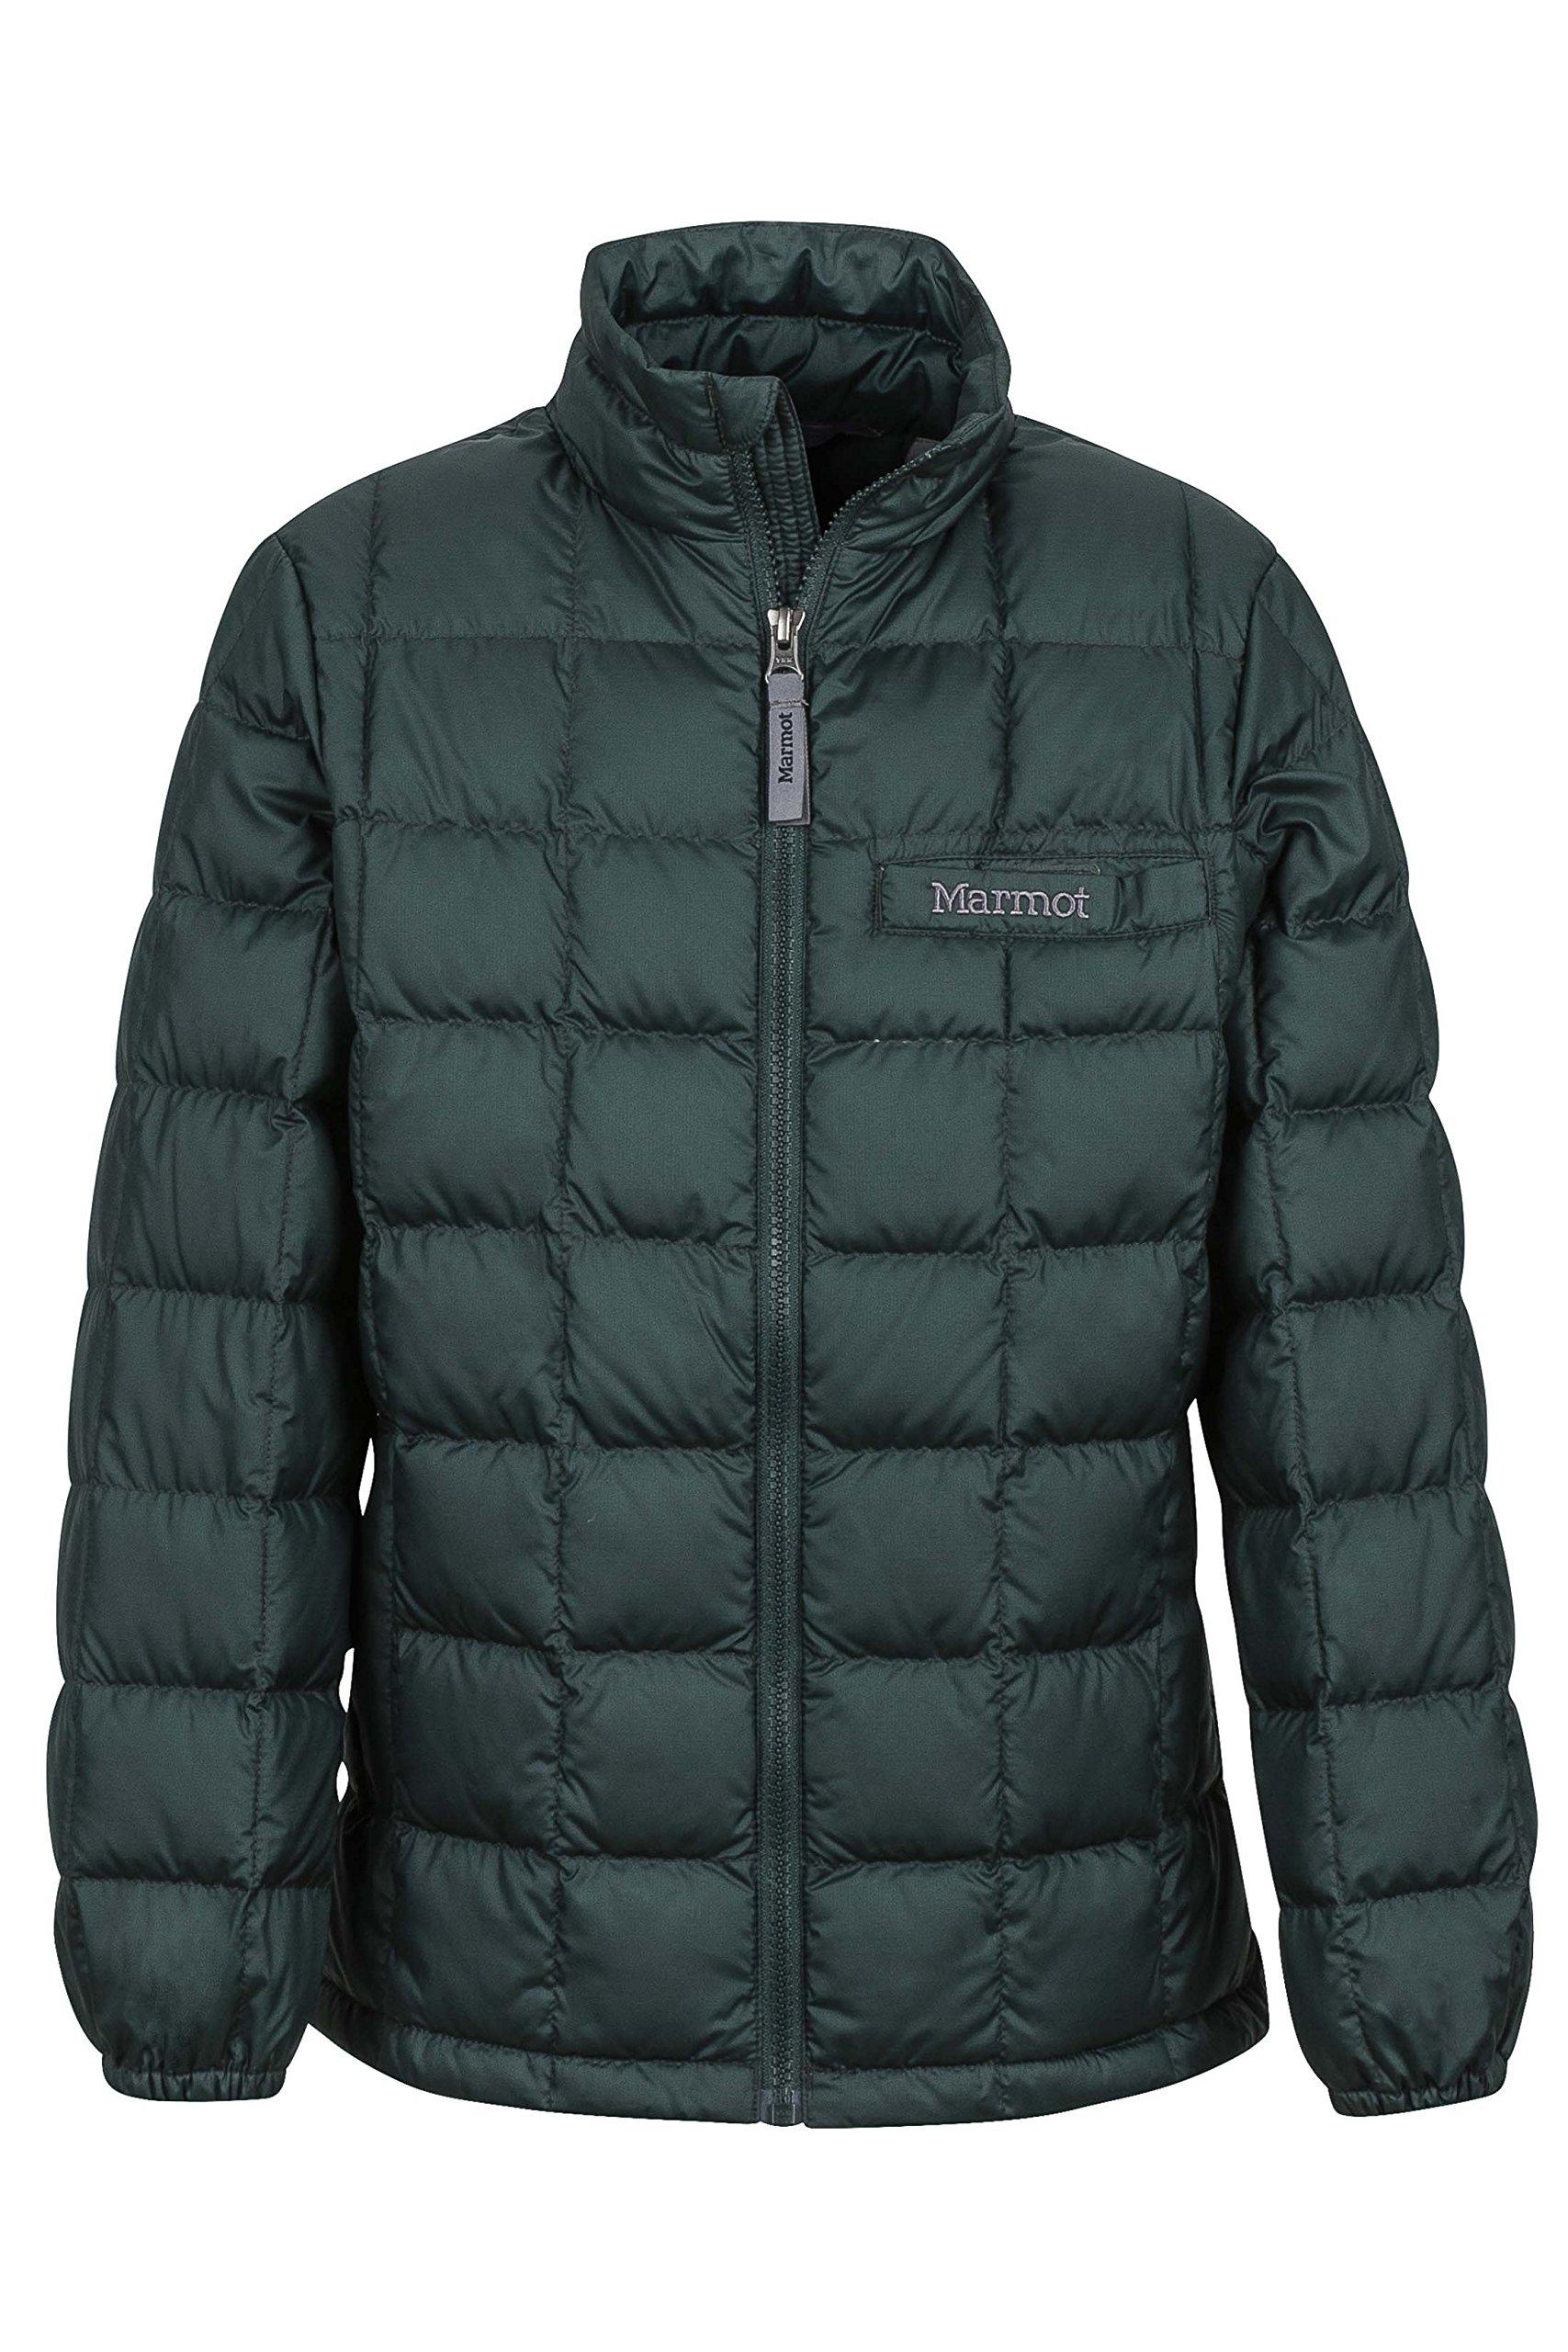 Marmot Ajax Boys' Down Puffer Jacket, Fill Power 600, Dark Spruce, X-Large by Marmot